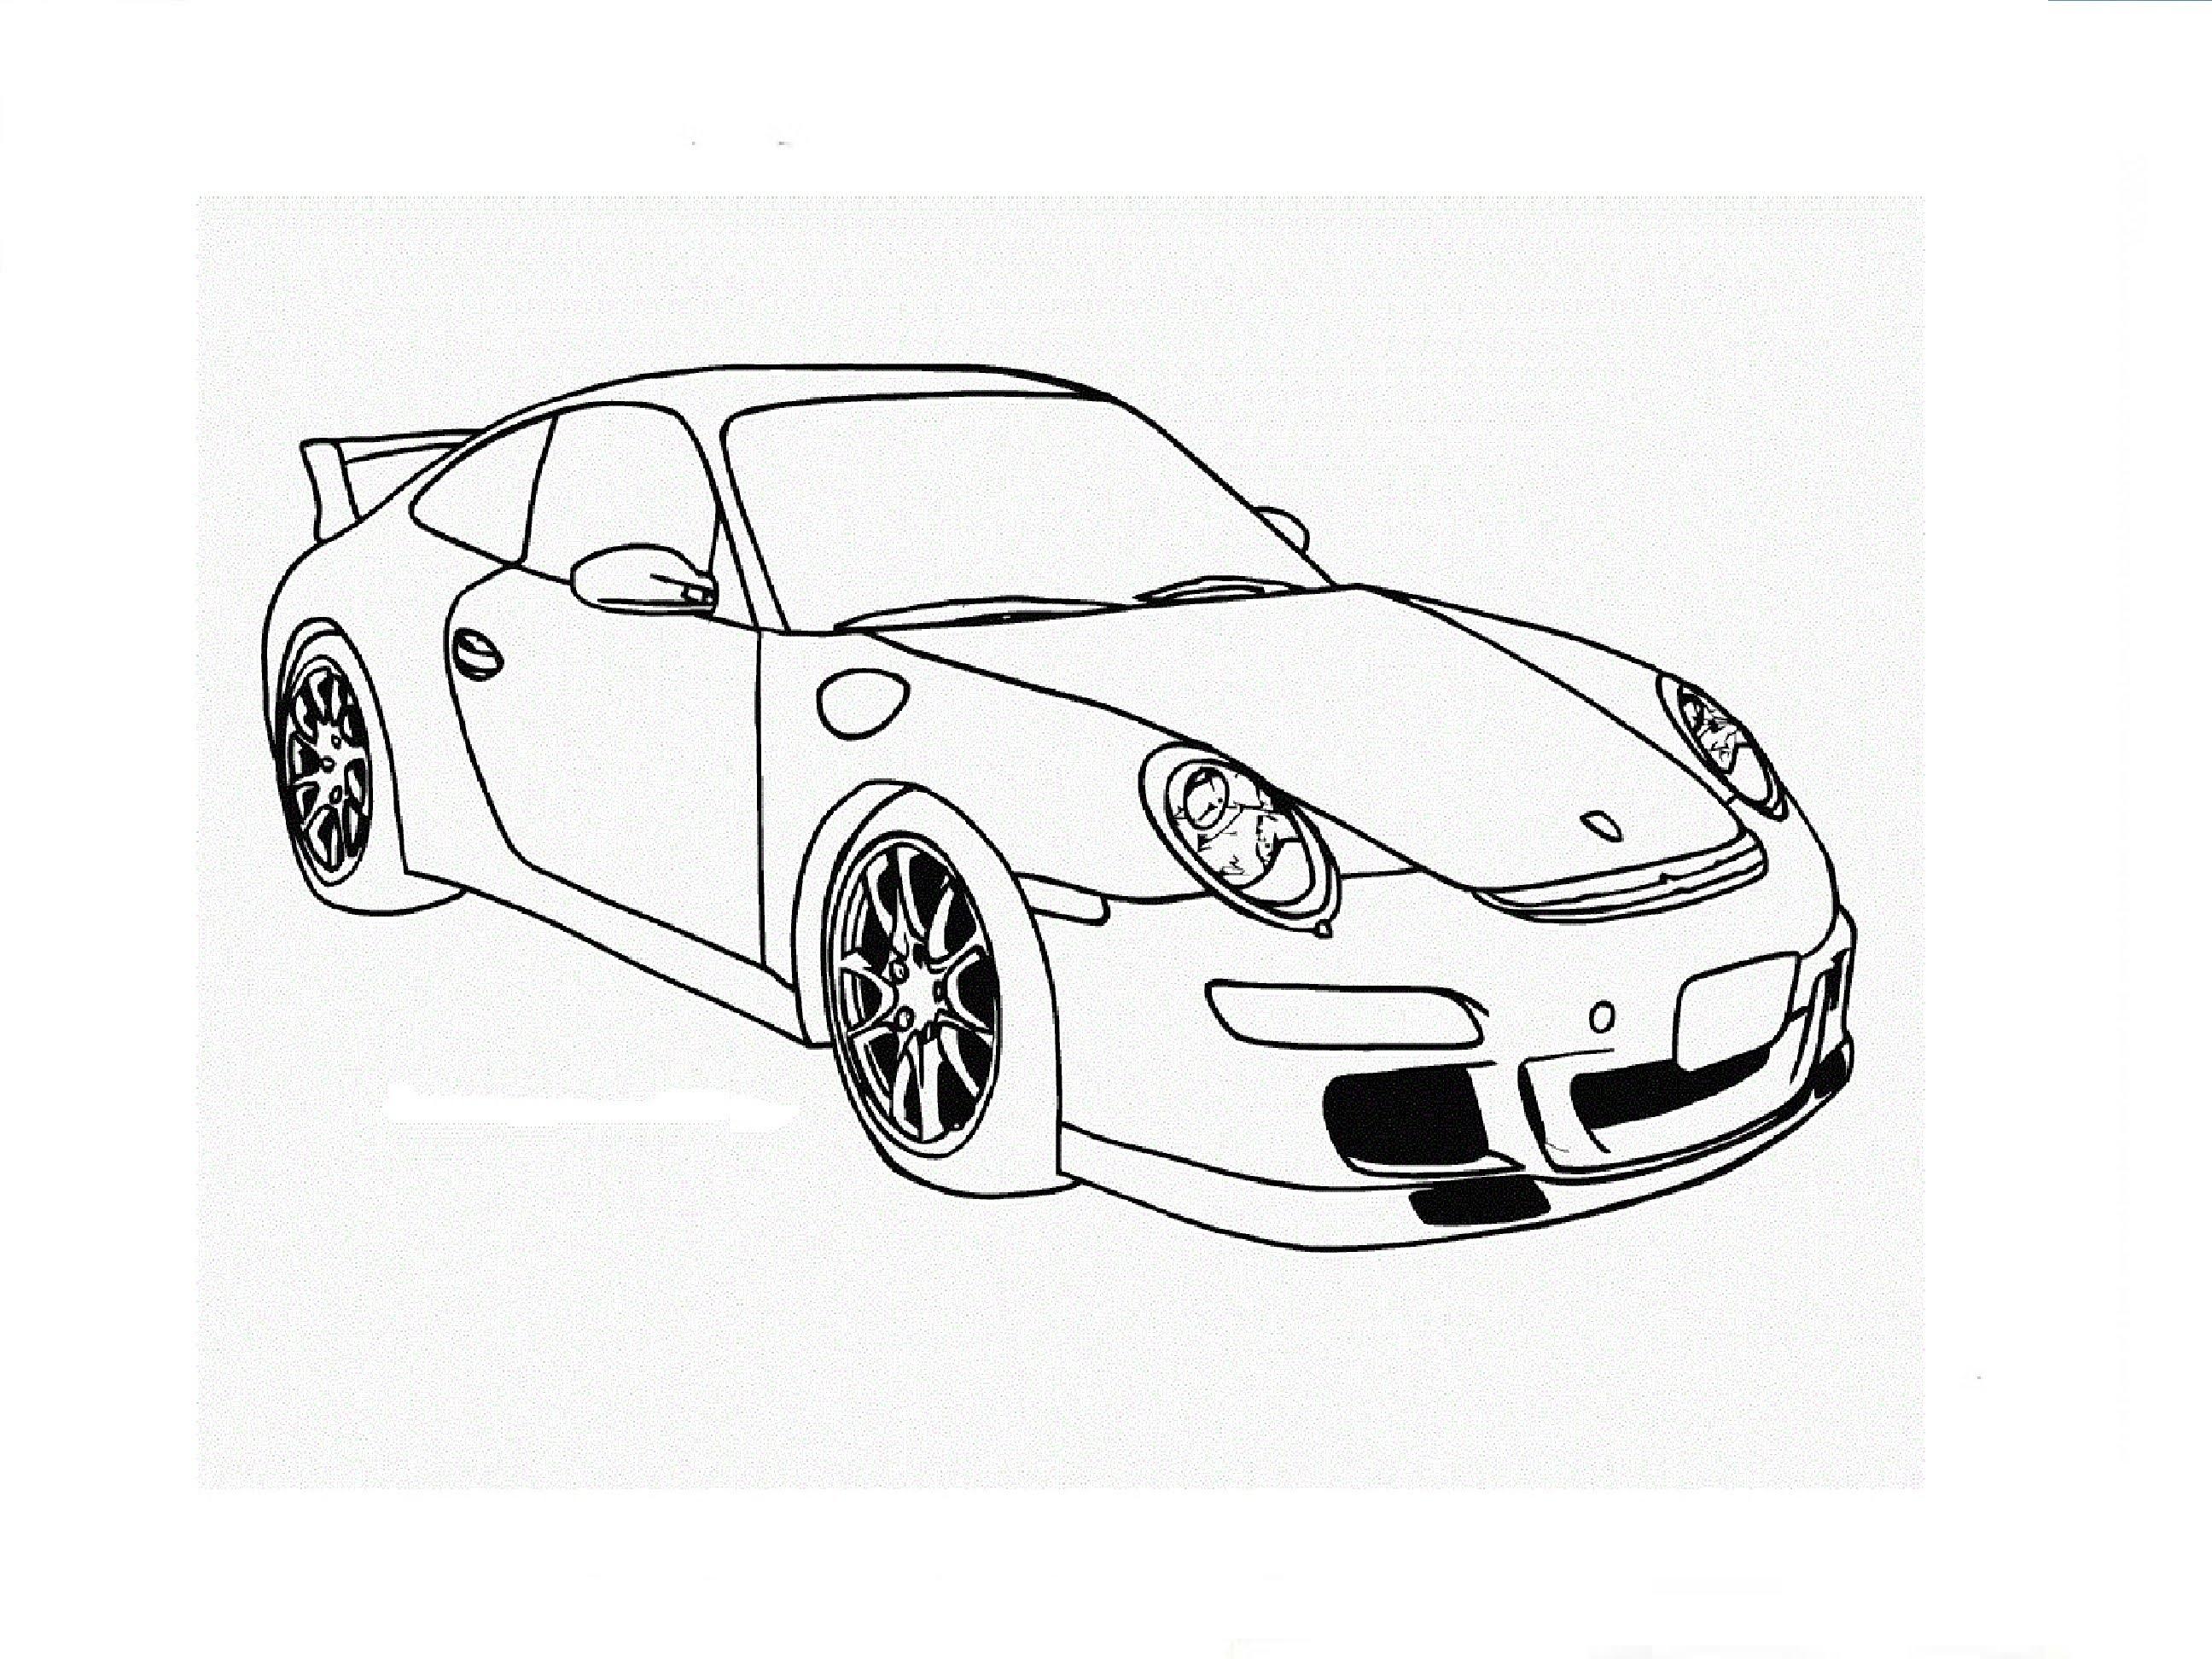 2592x1944 Speed Drawing Porsche 911 911